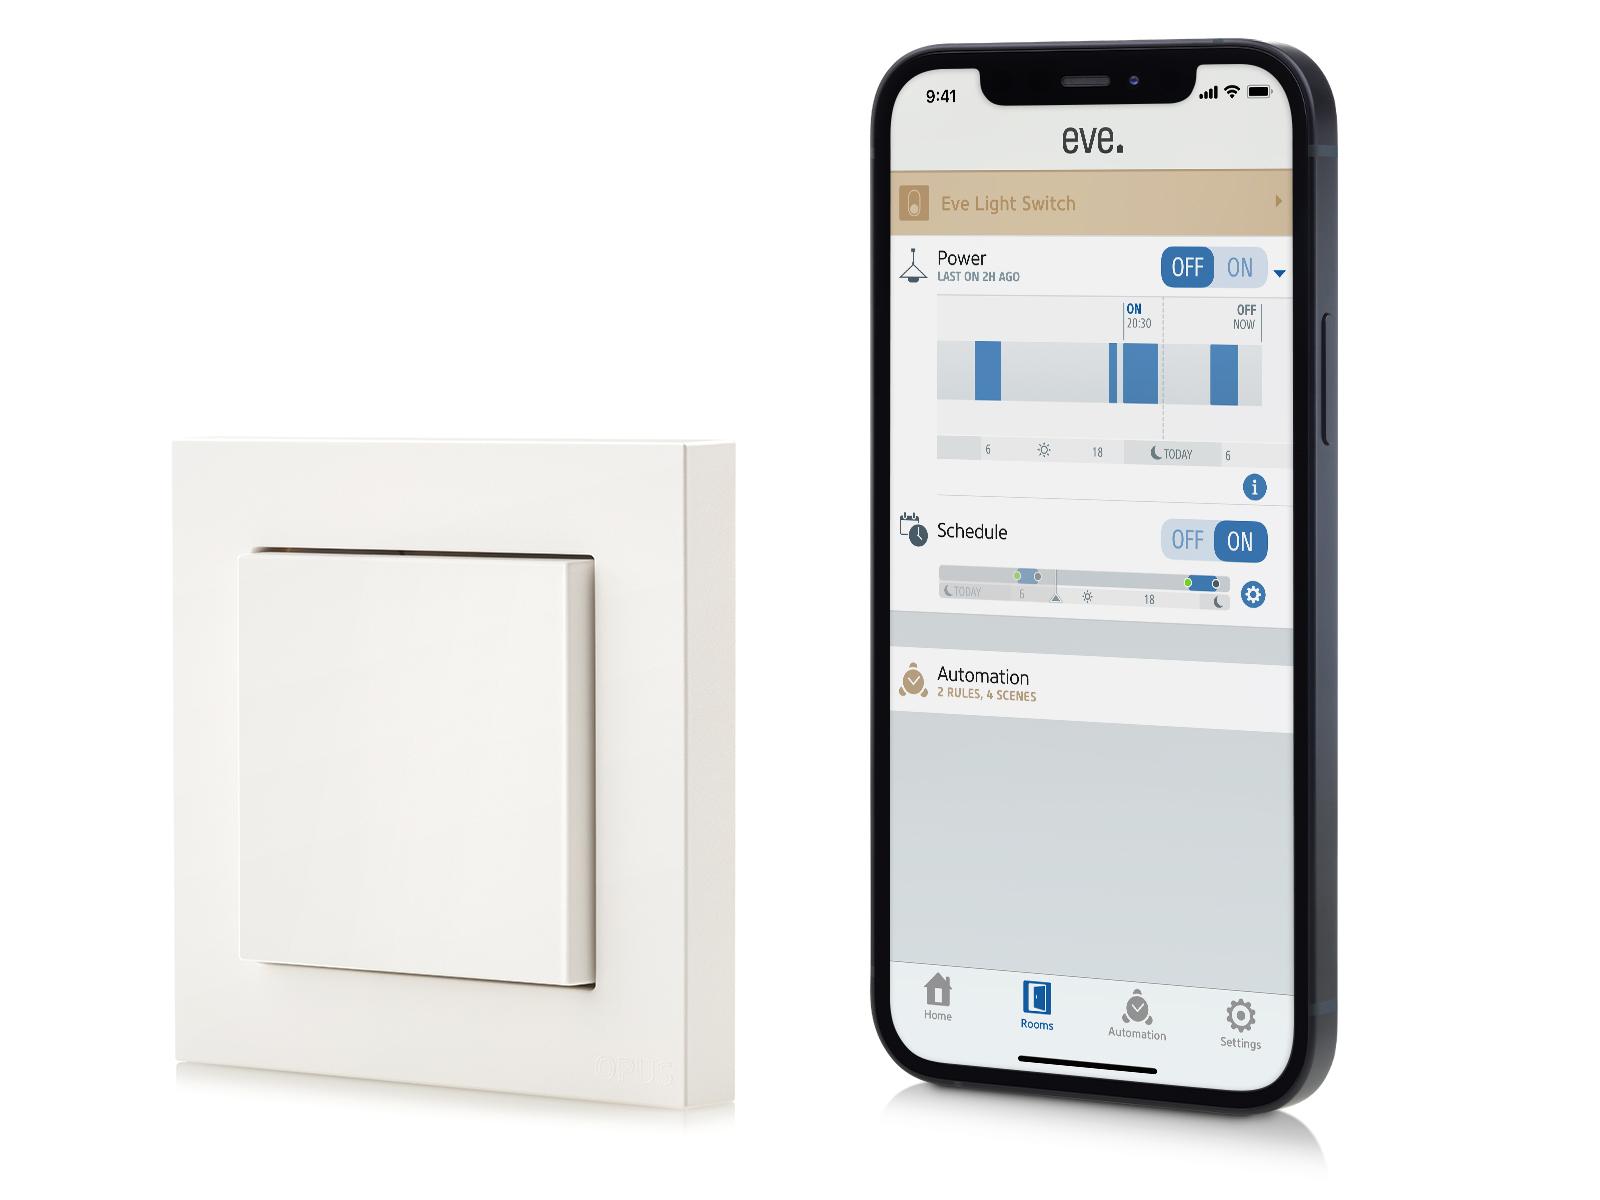 Eve Light Switch (EU)